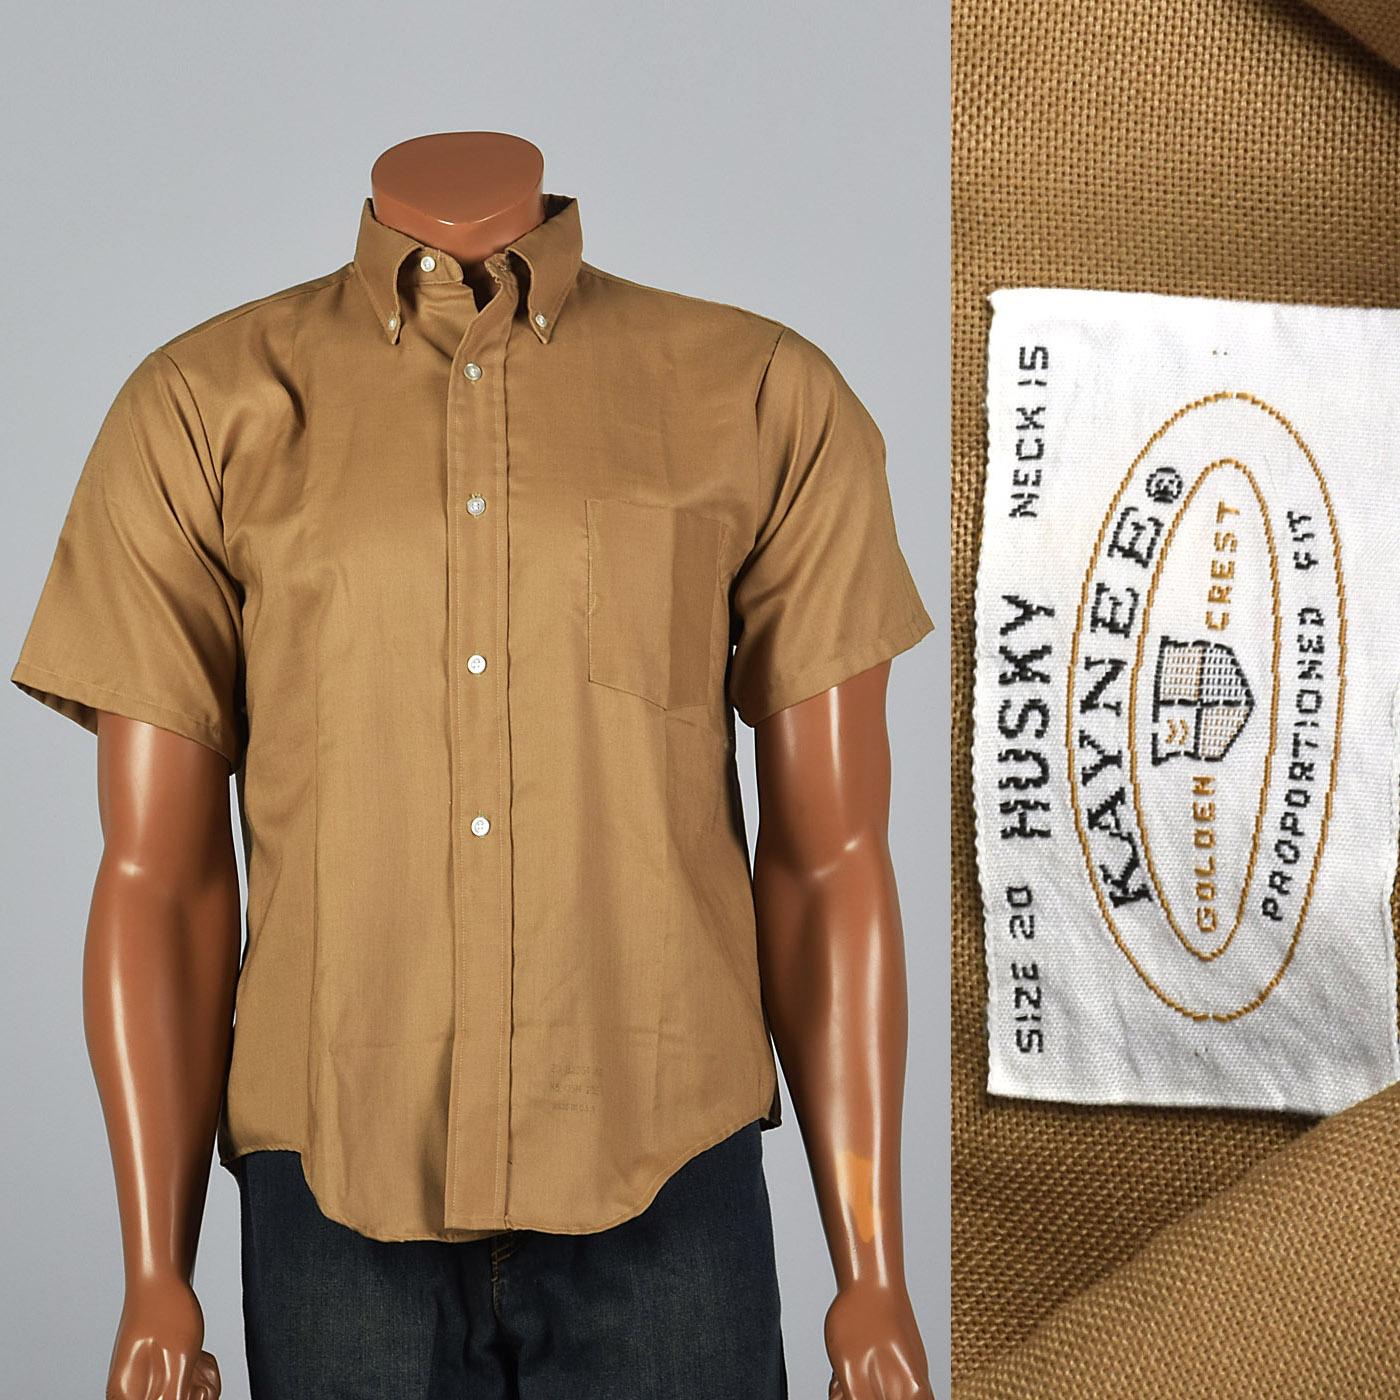 688e4987f8c Mens Dress Shirts Size 20 Neck - DREAMWORKS